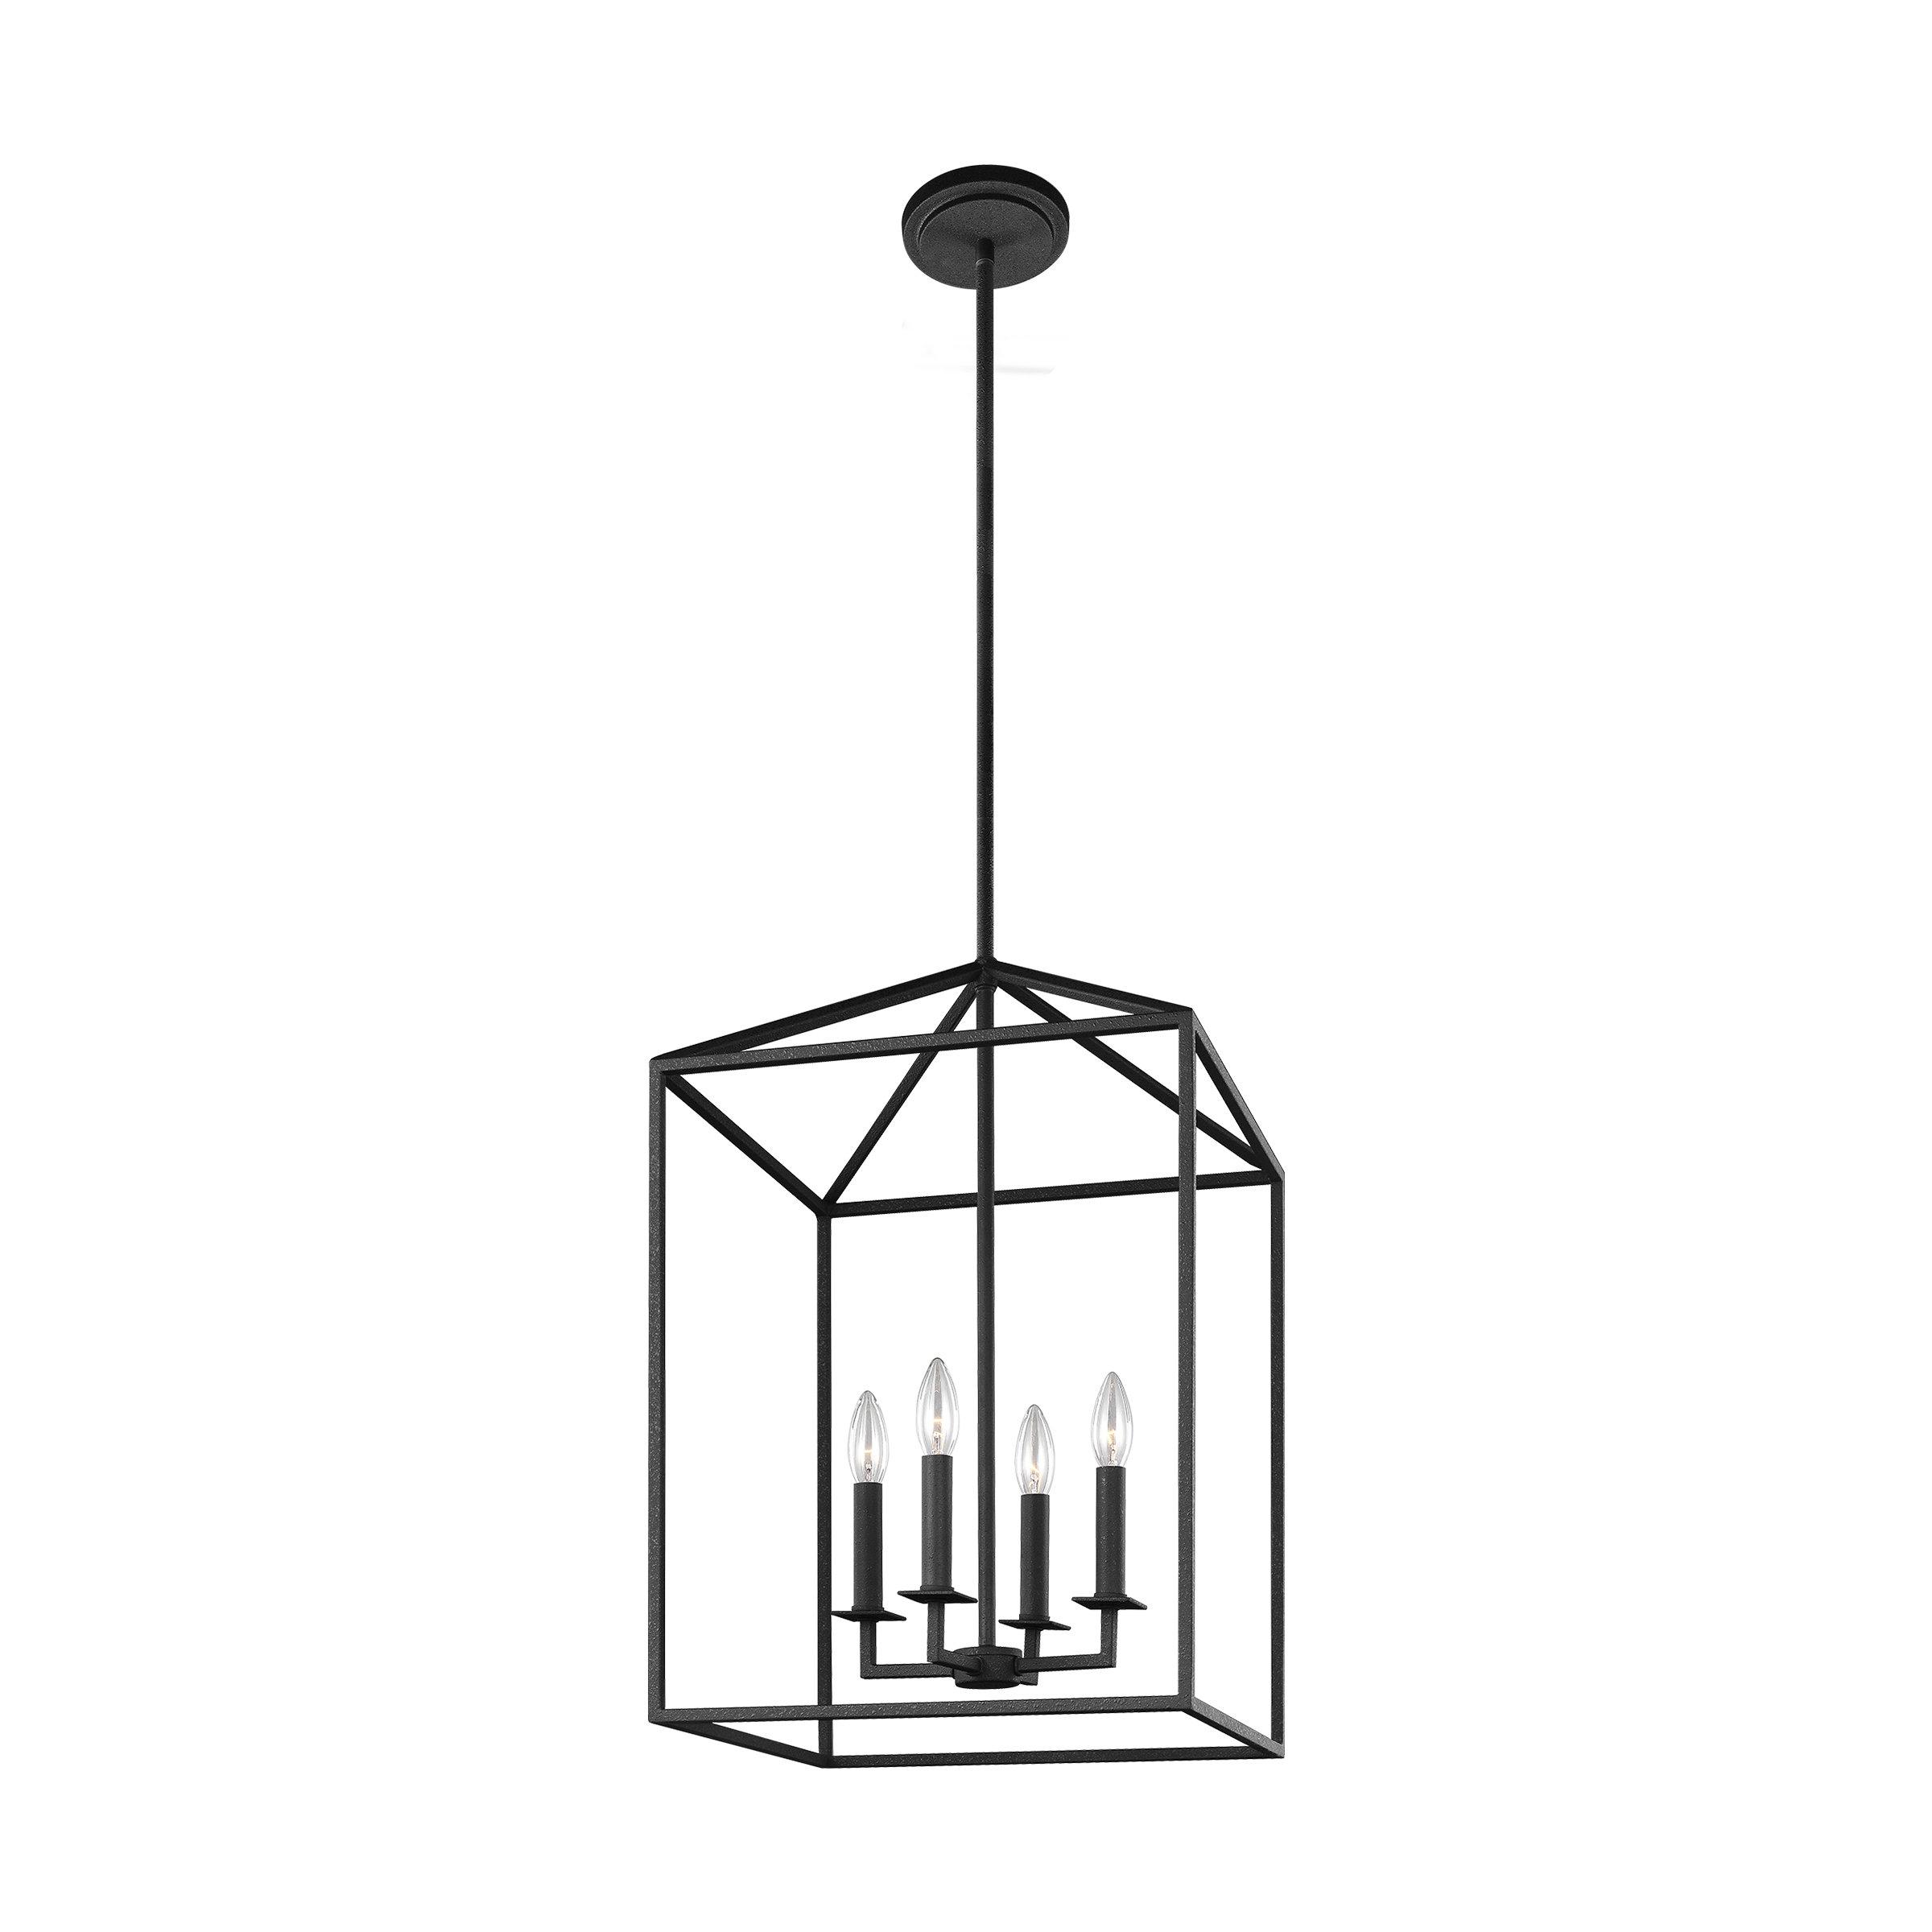 Thorne 6 Light Lantern Square / Rectangle Pendants Inside Latest Odie 4 Light Lantern Square/rectangle Pendant (View 16 of 20)